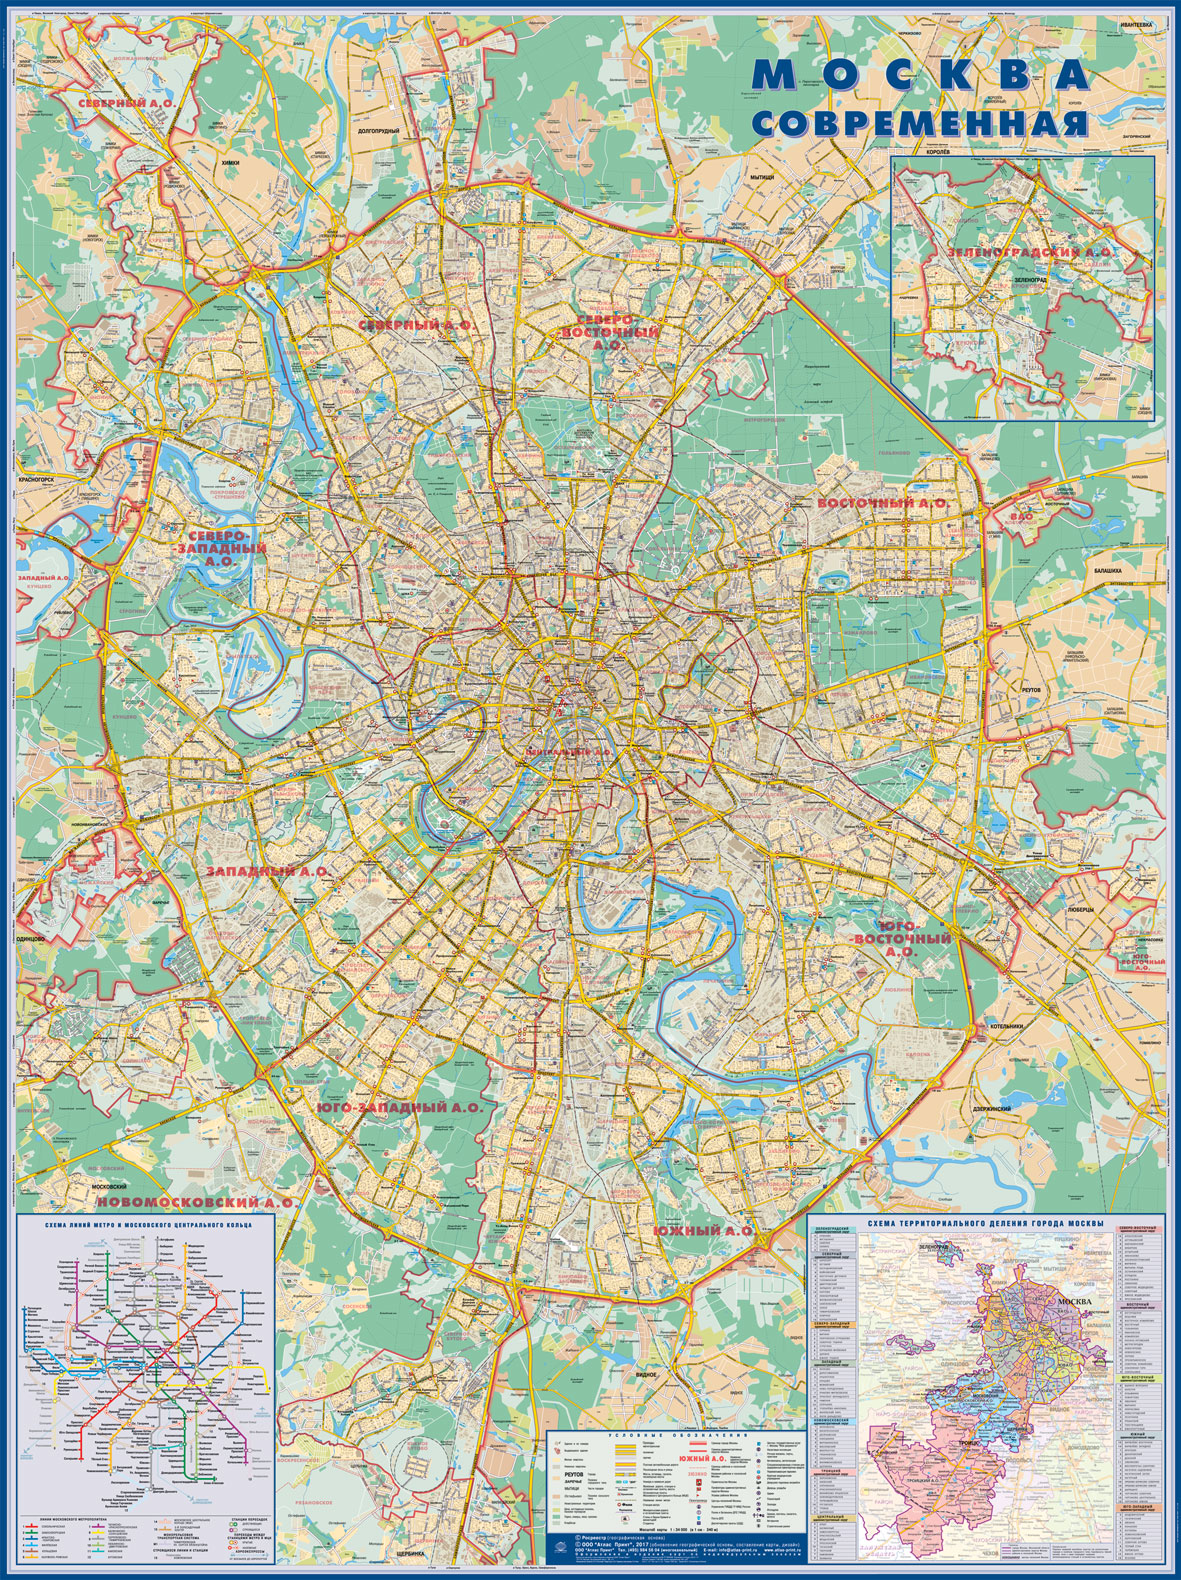 Настенная карта Москвы *Москва современная*  размер 1,18х1,58 м